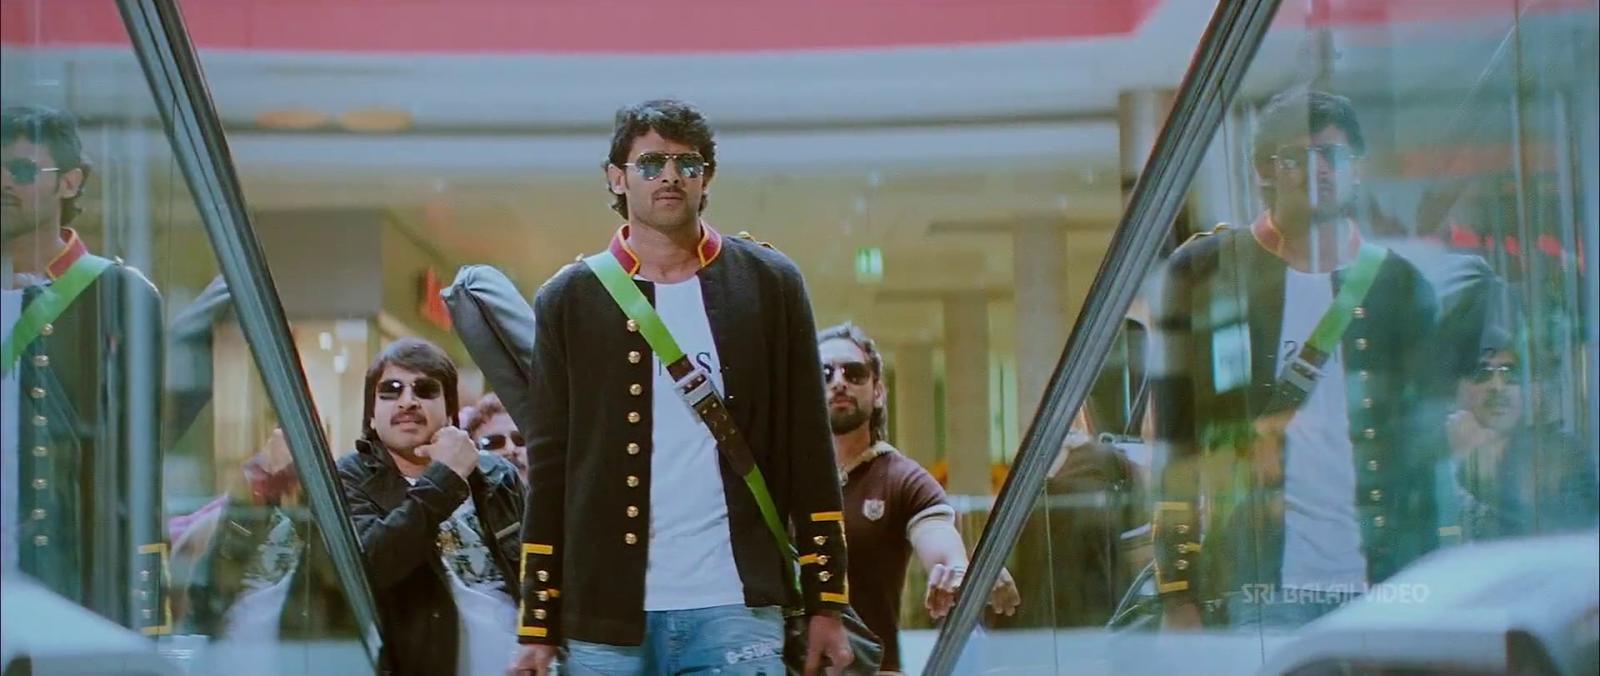 Prabhas Fans Forever: Darling Movie Dharmavarapu & Prabhas Funny Scene Snaps